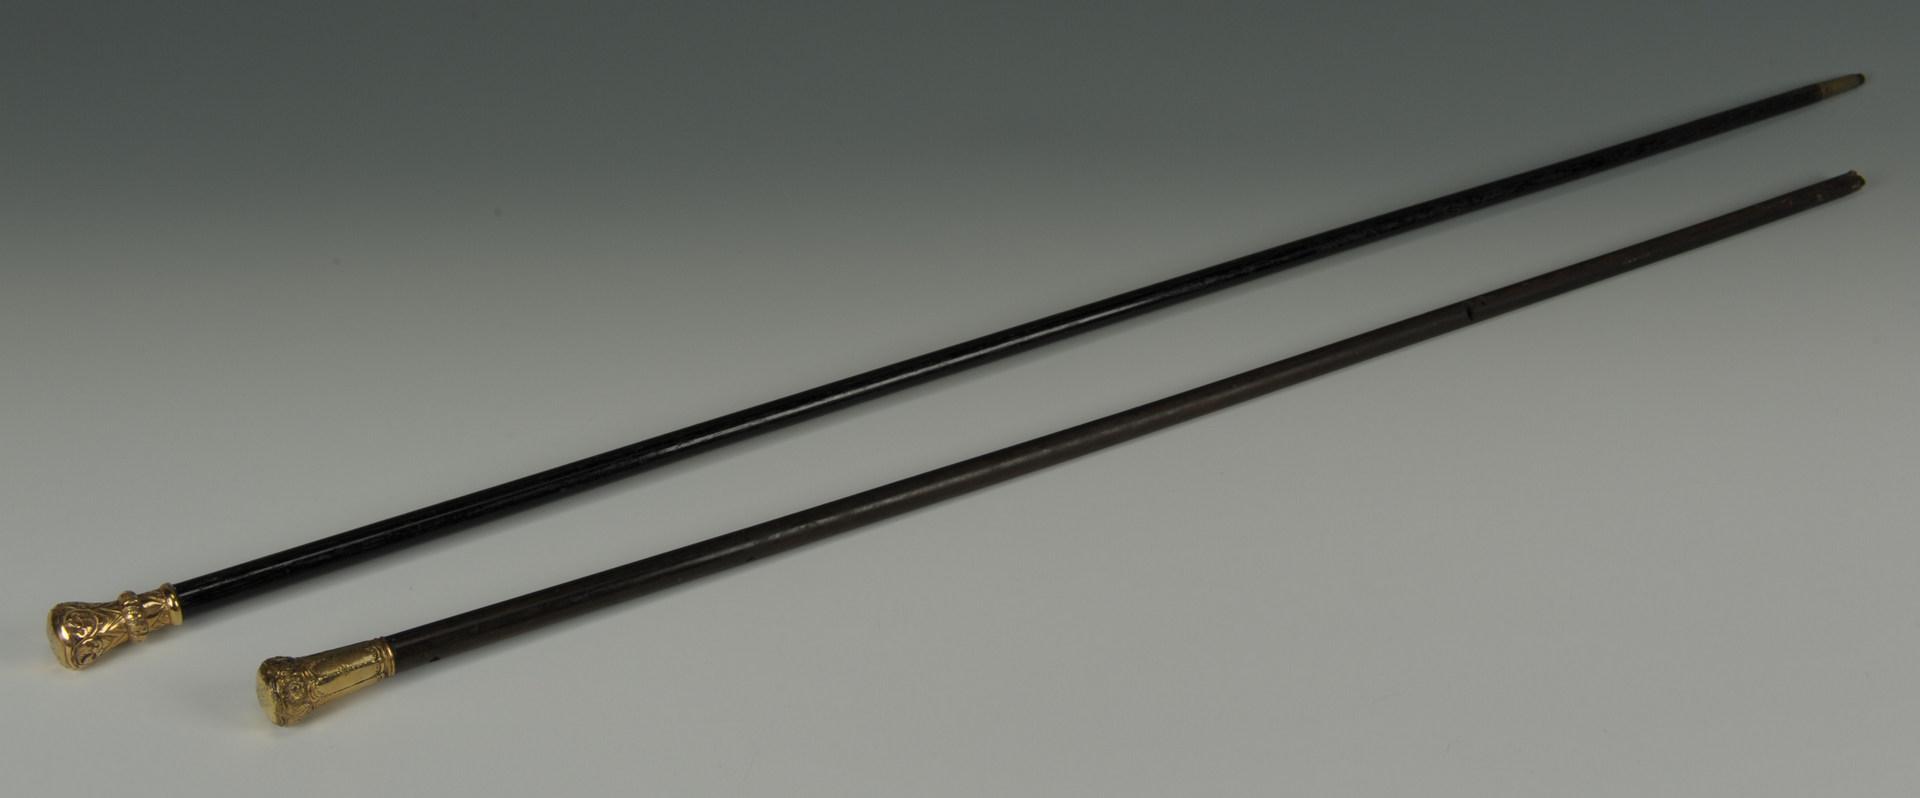 Lot 512: Two gold handled walking sticks, 19th c.